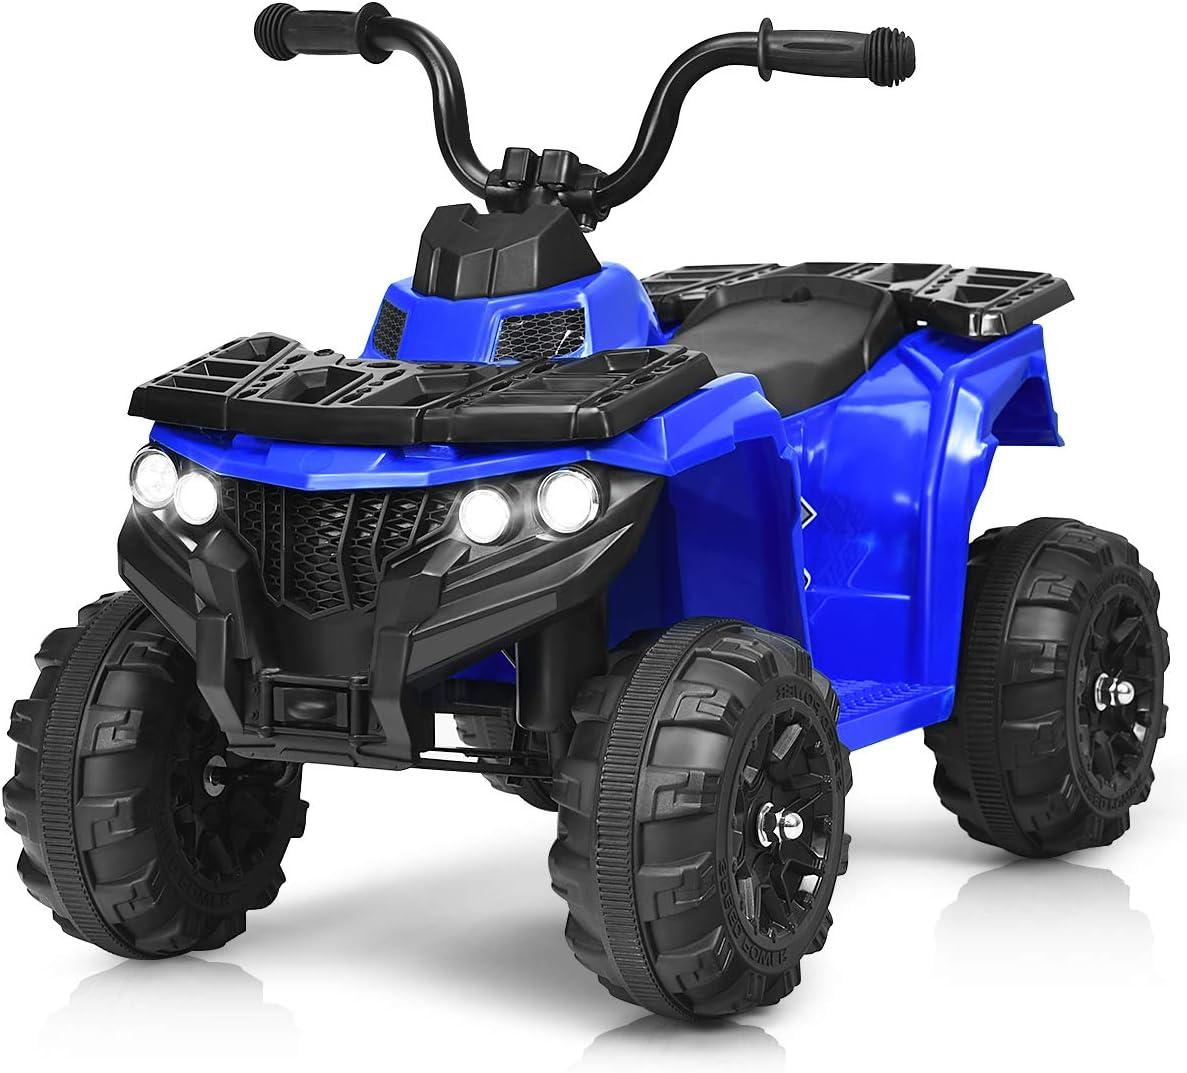 Costzon Ride on ATV Electric Ride